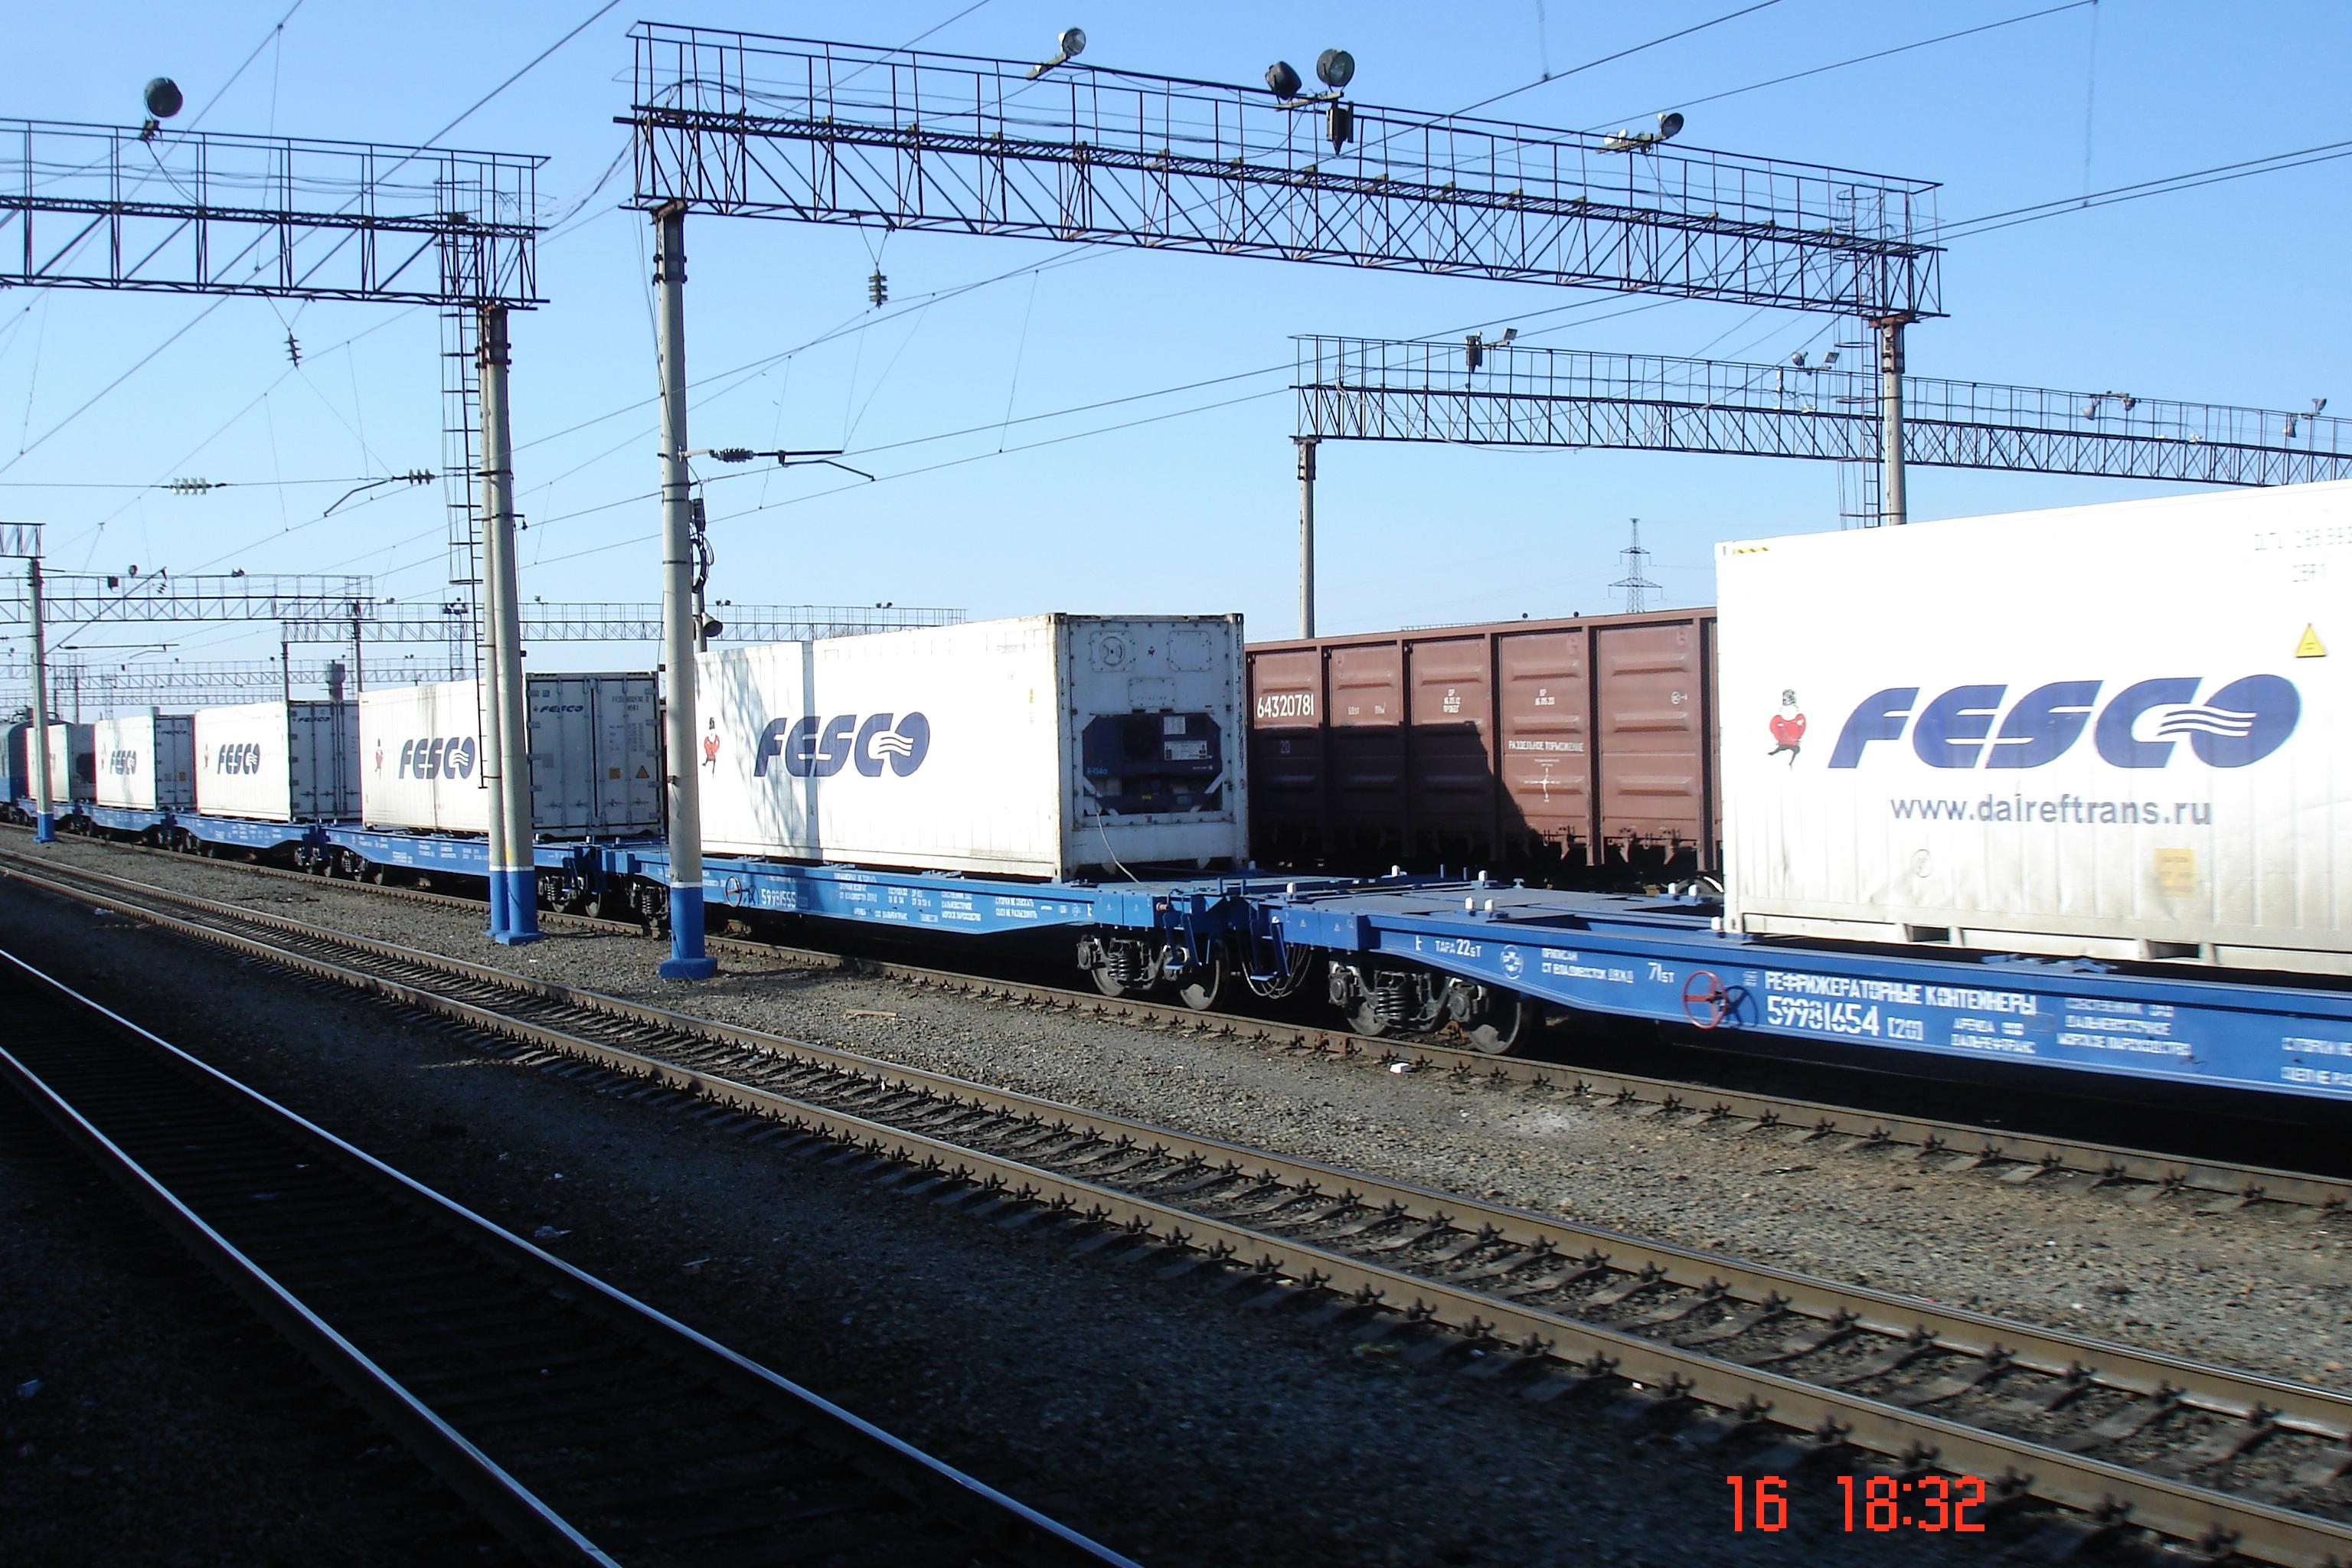 вагоны платформа фото: